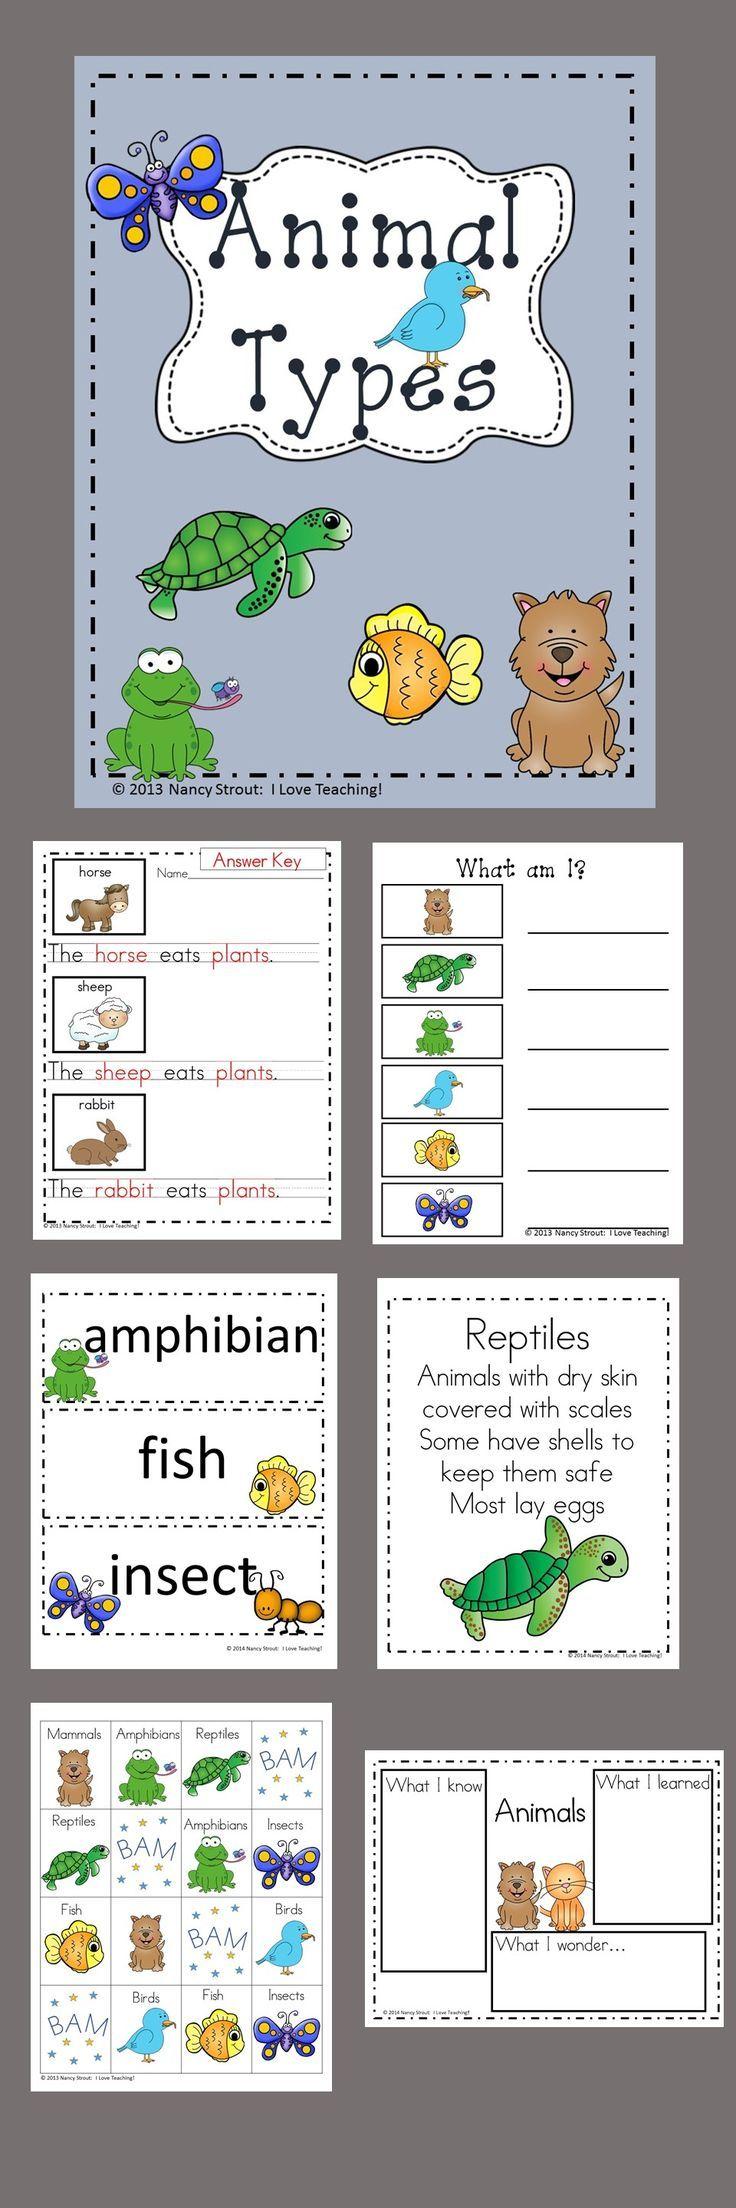 Animals Classifying Animal Types Homeschool Programs Vocabulary Cards Teacher Helper [ 2208 x 736 Pixel ]